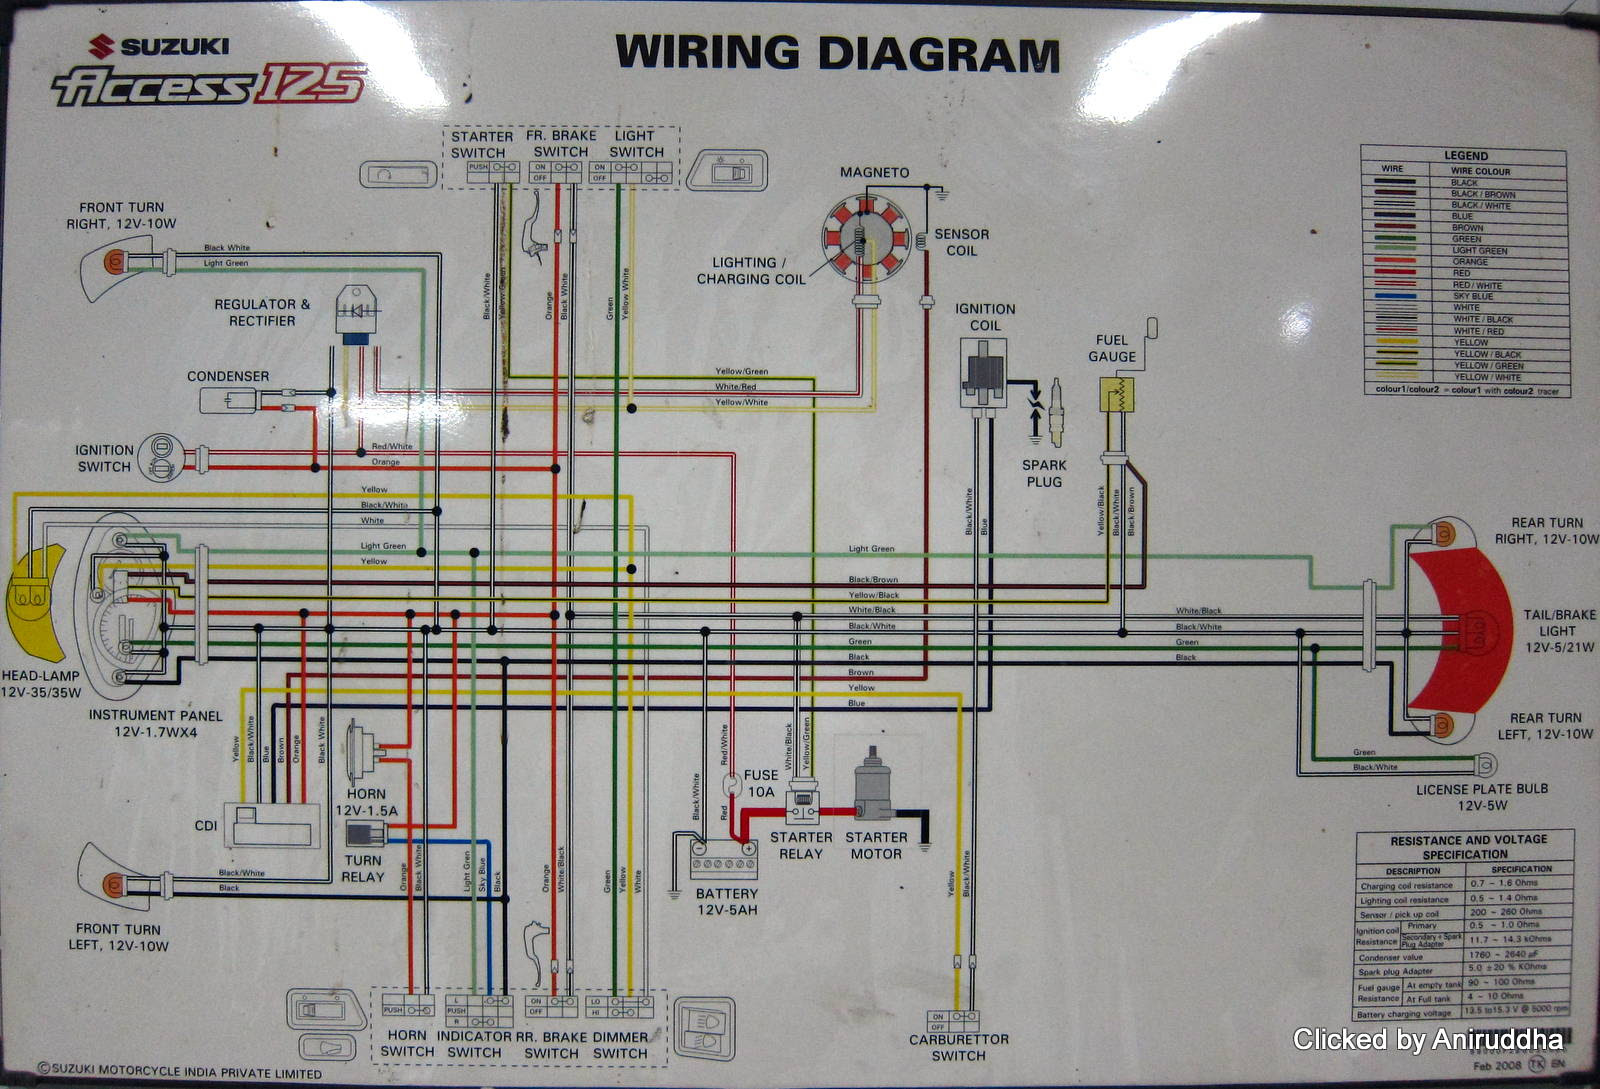 suzuki gn 125 electric circet pdf - wiring diagram prev wave-view-b -  wave-view-b.bookyourstudy.fr  bookyourstudy.fr